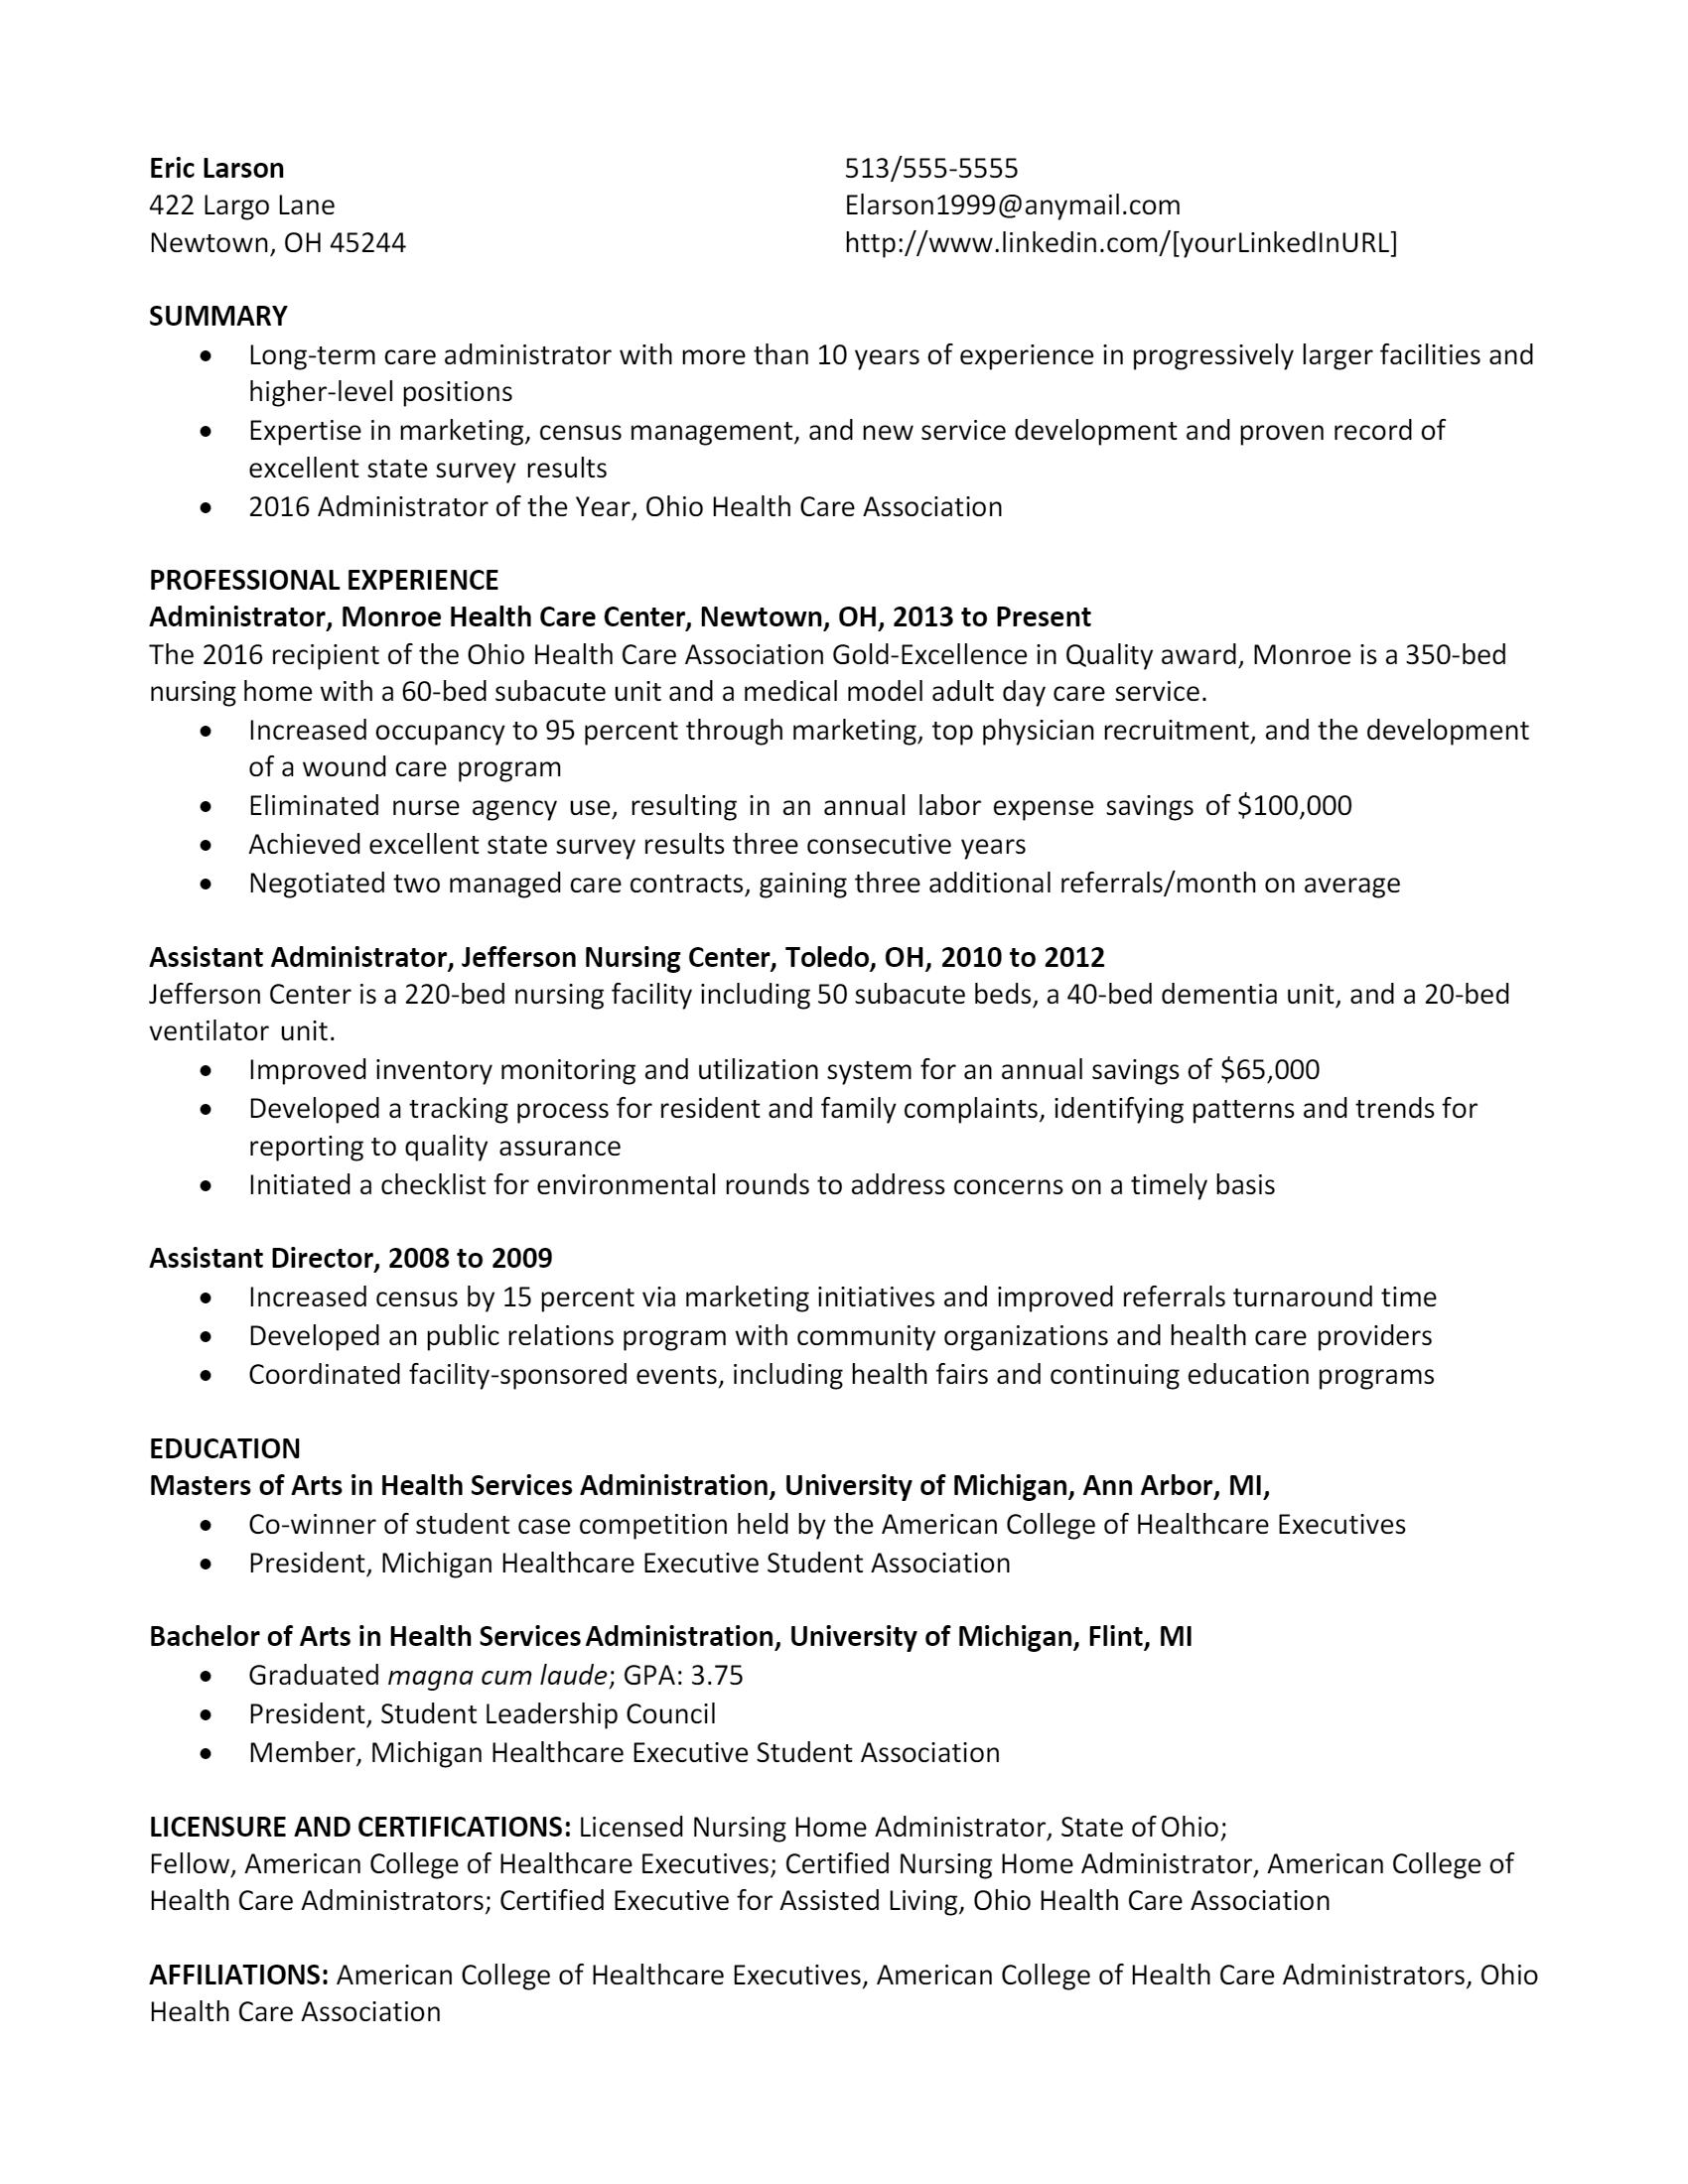 Healthcare Administrator Resume .Docx (Word)